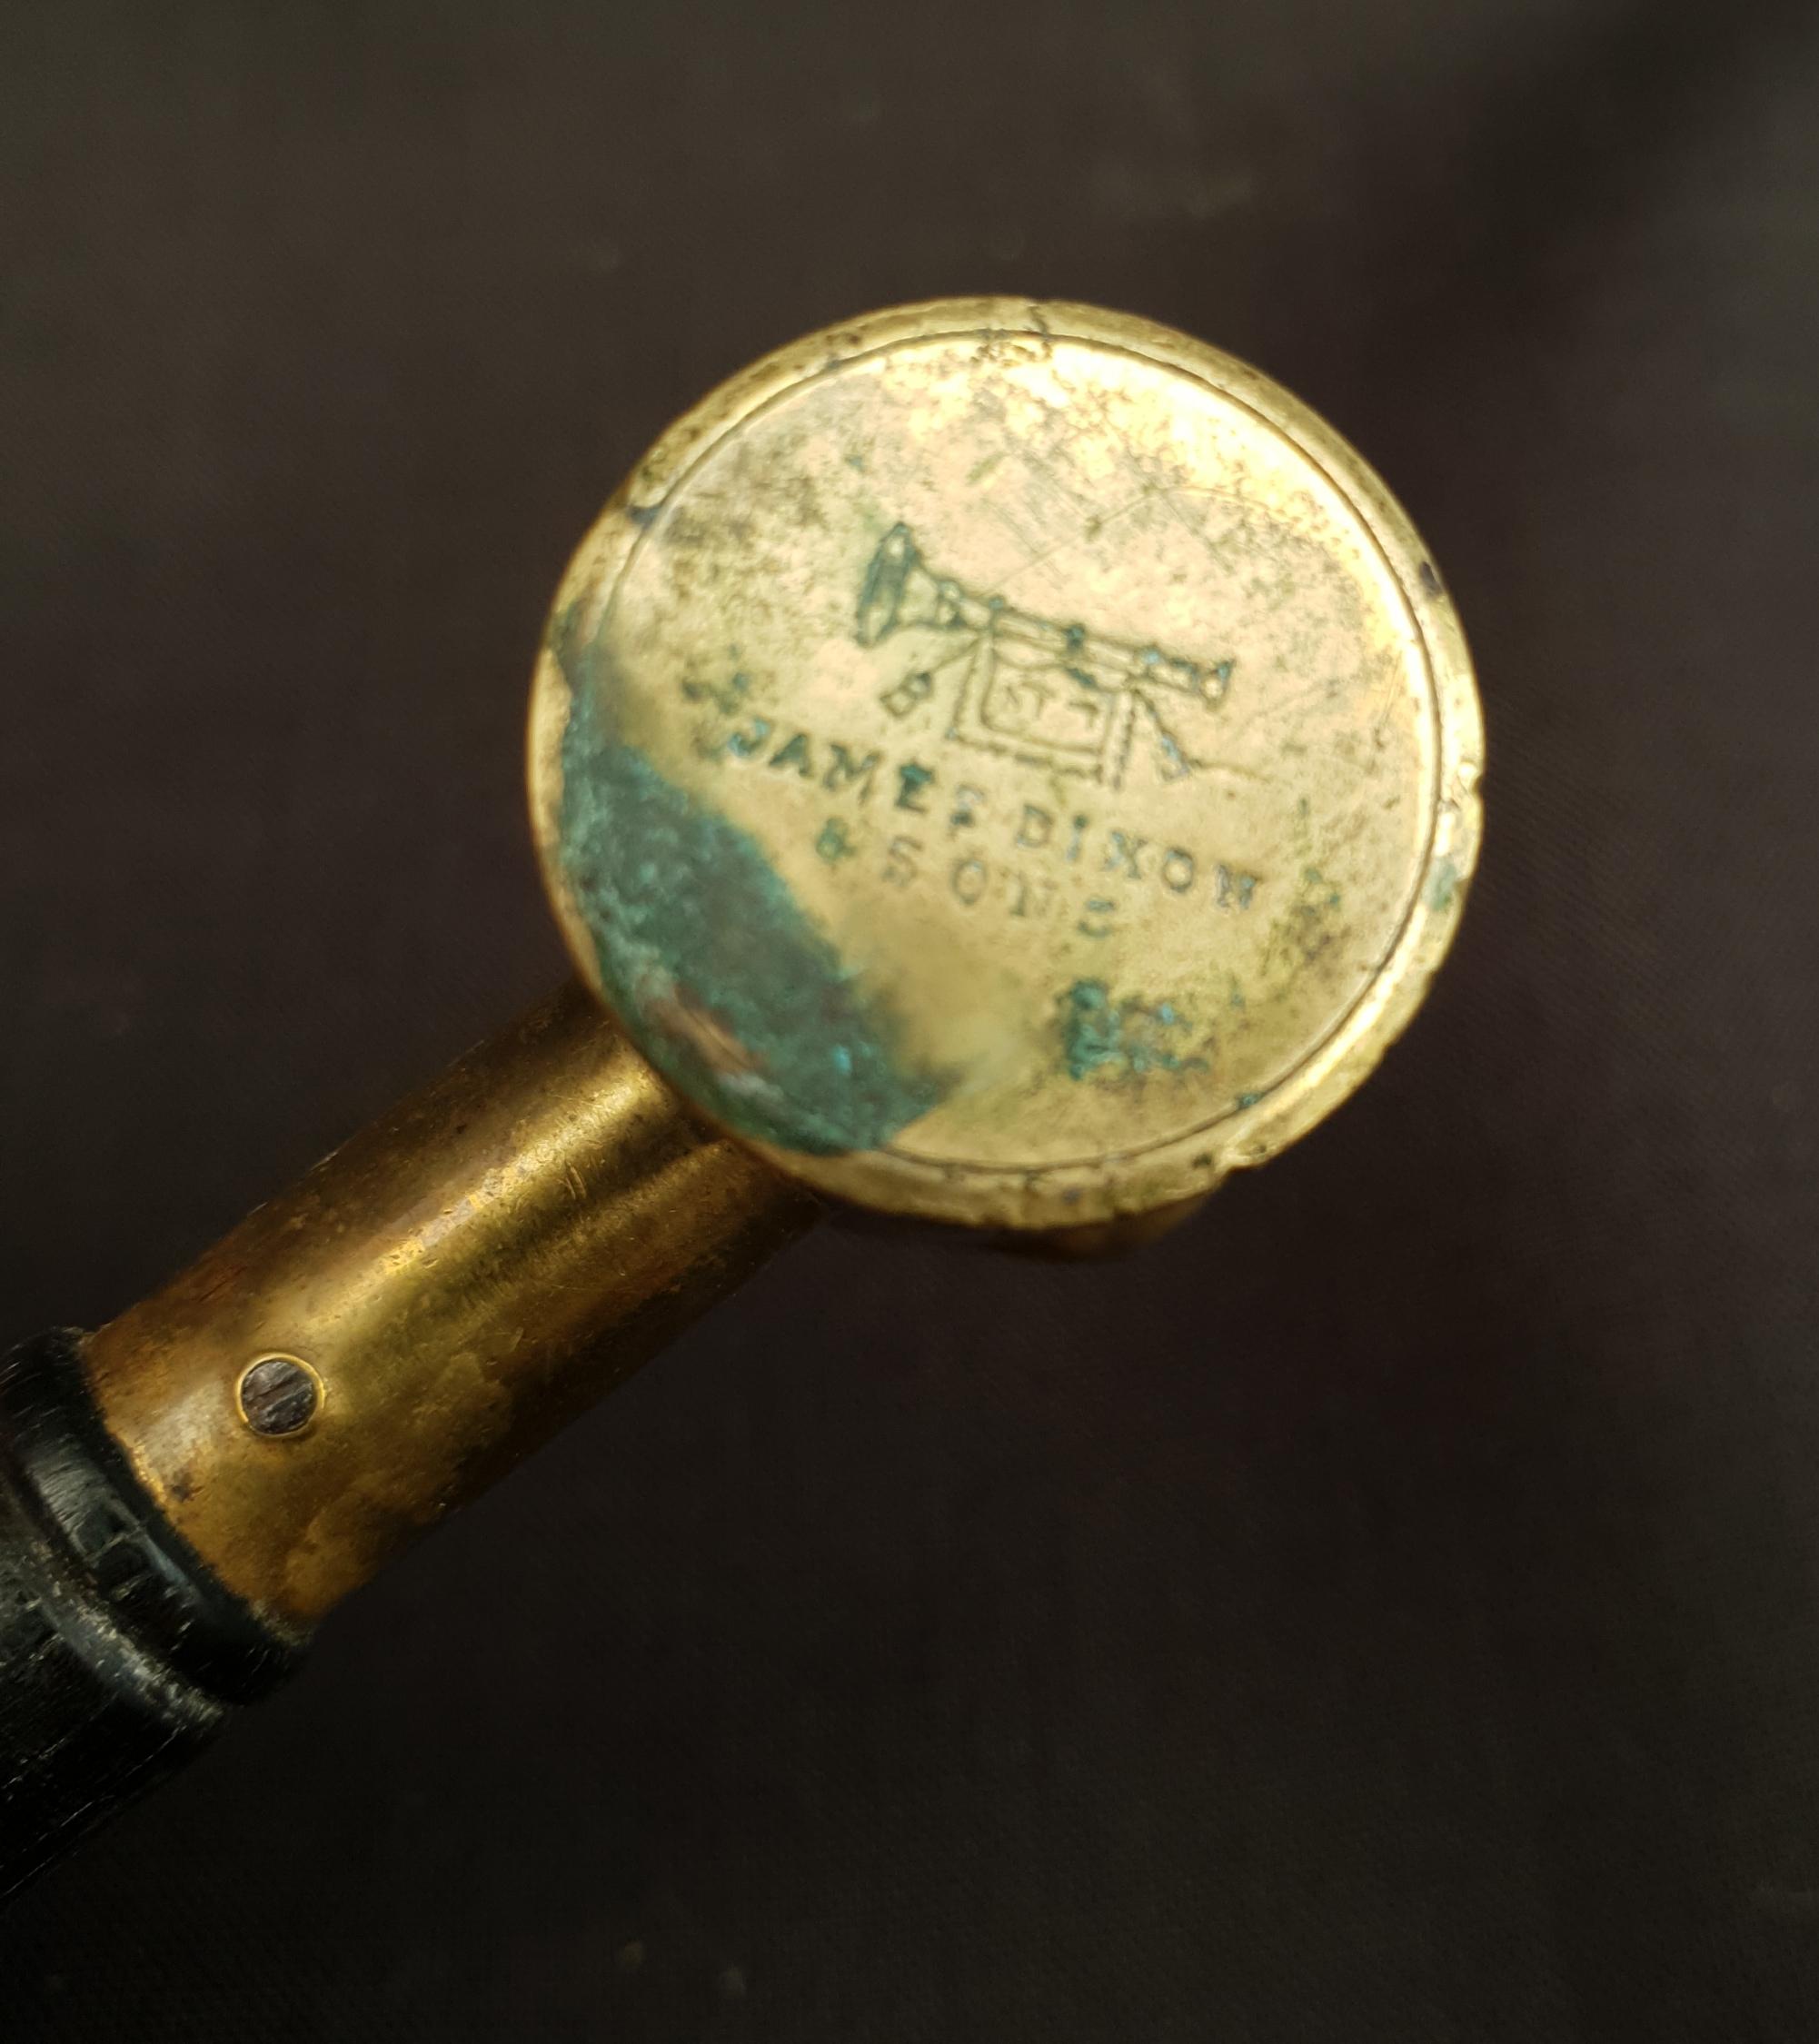 Antique Shooting 2 x Dixon & Co Black Powder Measures & Bussey Brass Measure - Image 3 of 4